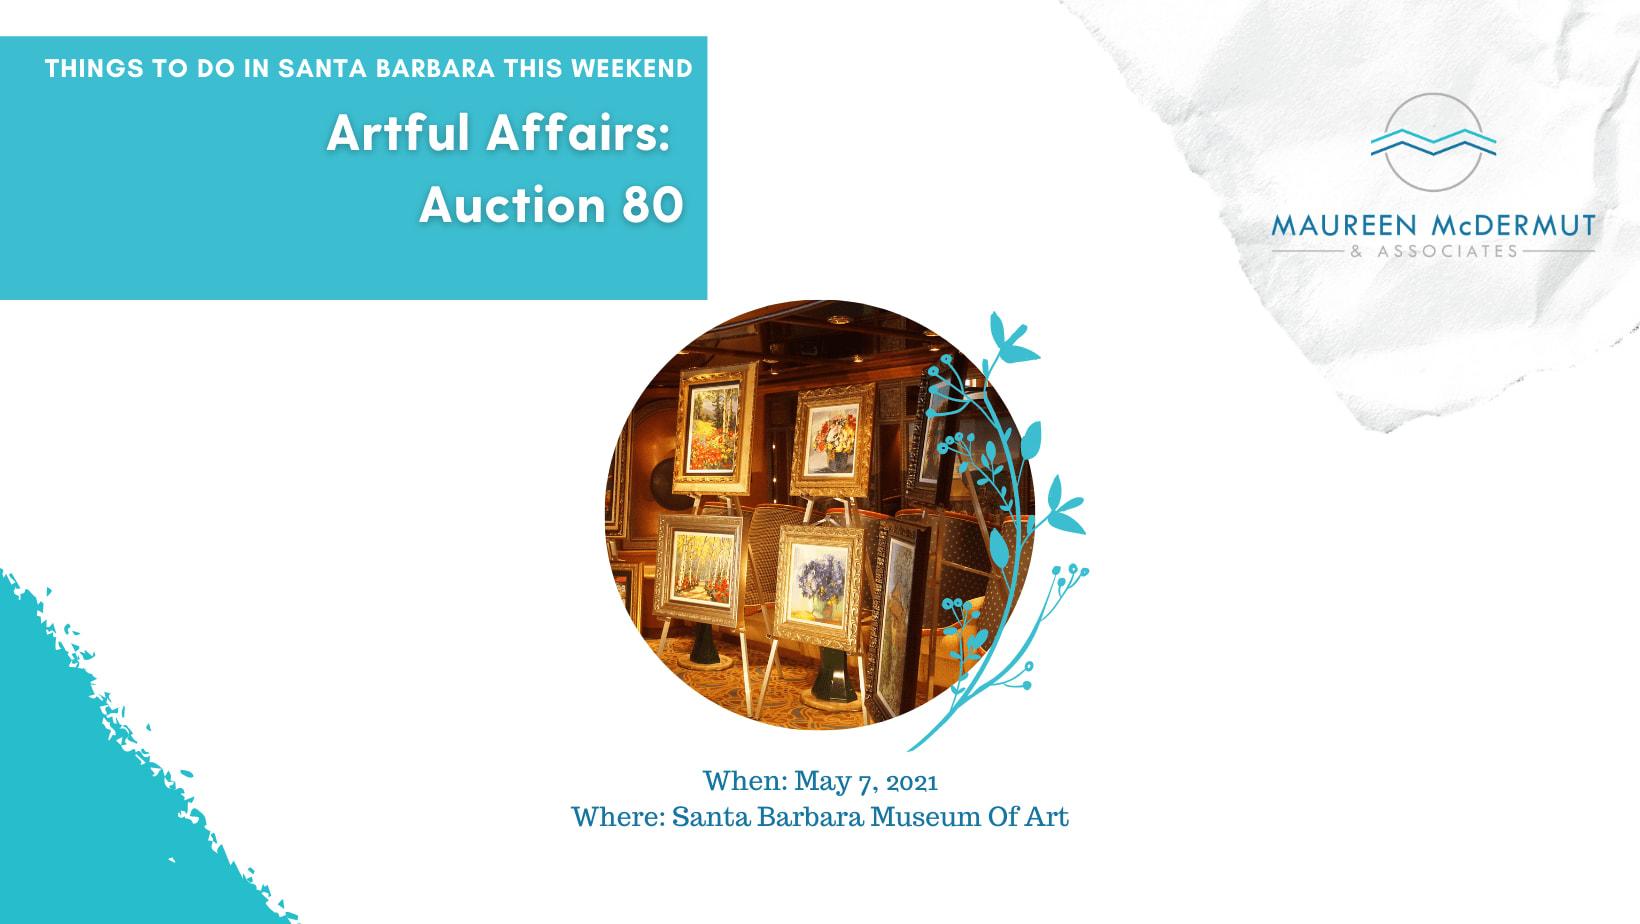 Artful Affairs: Auction 80 image